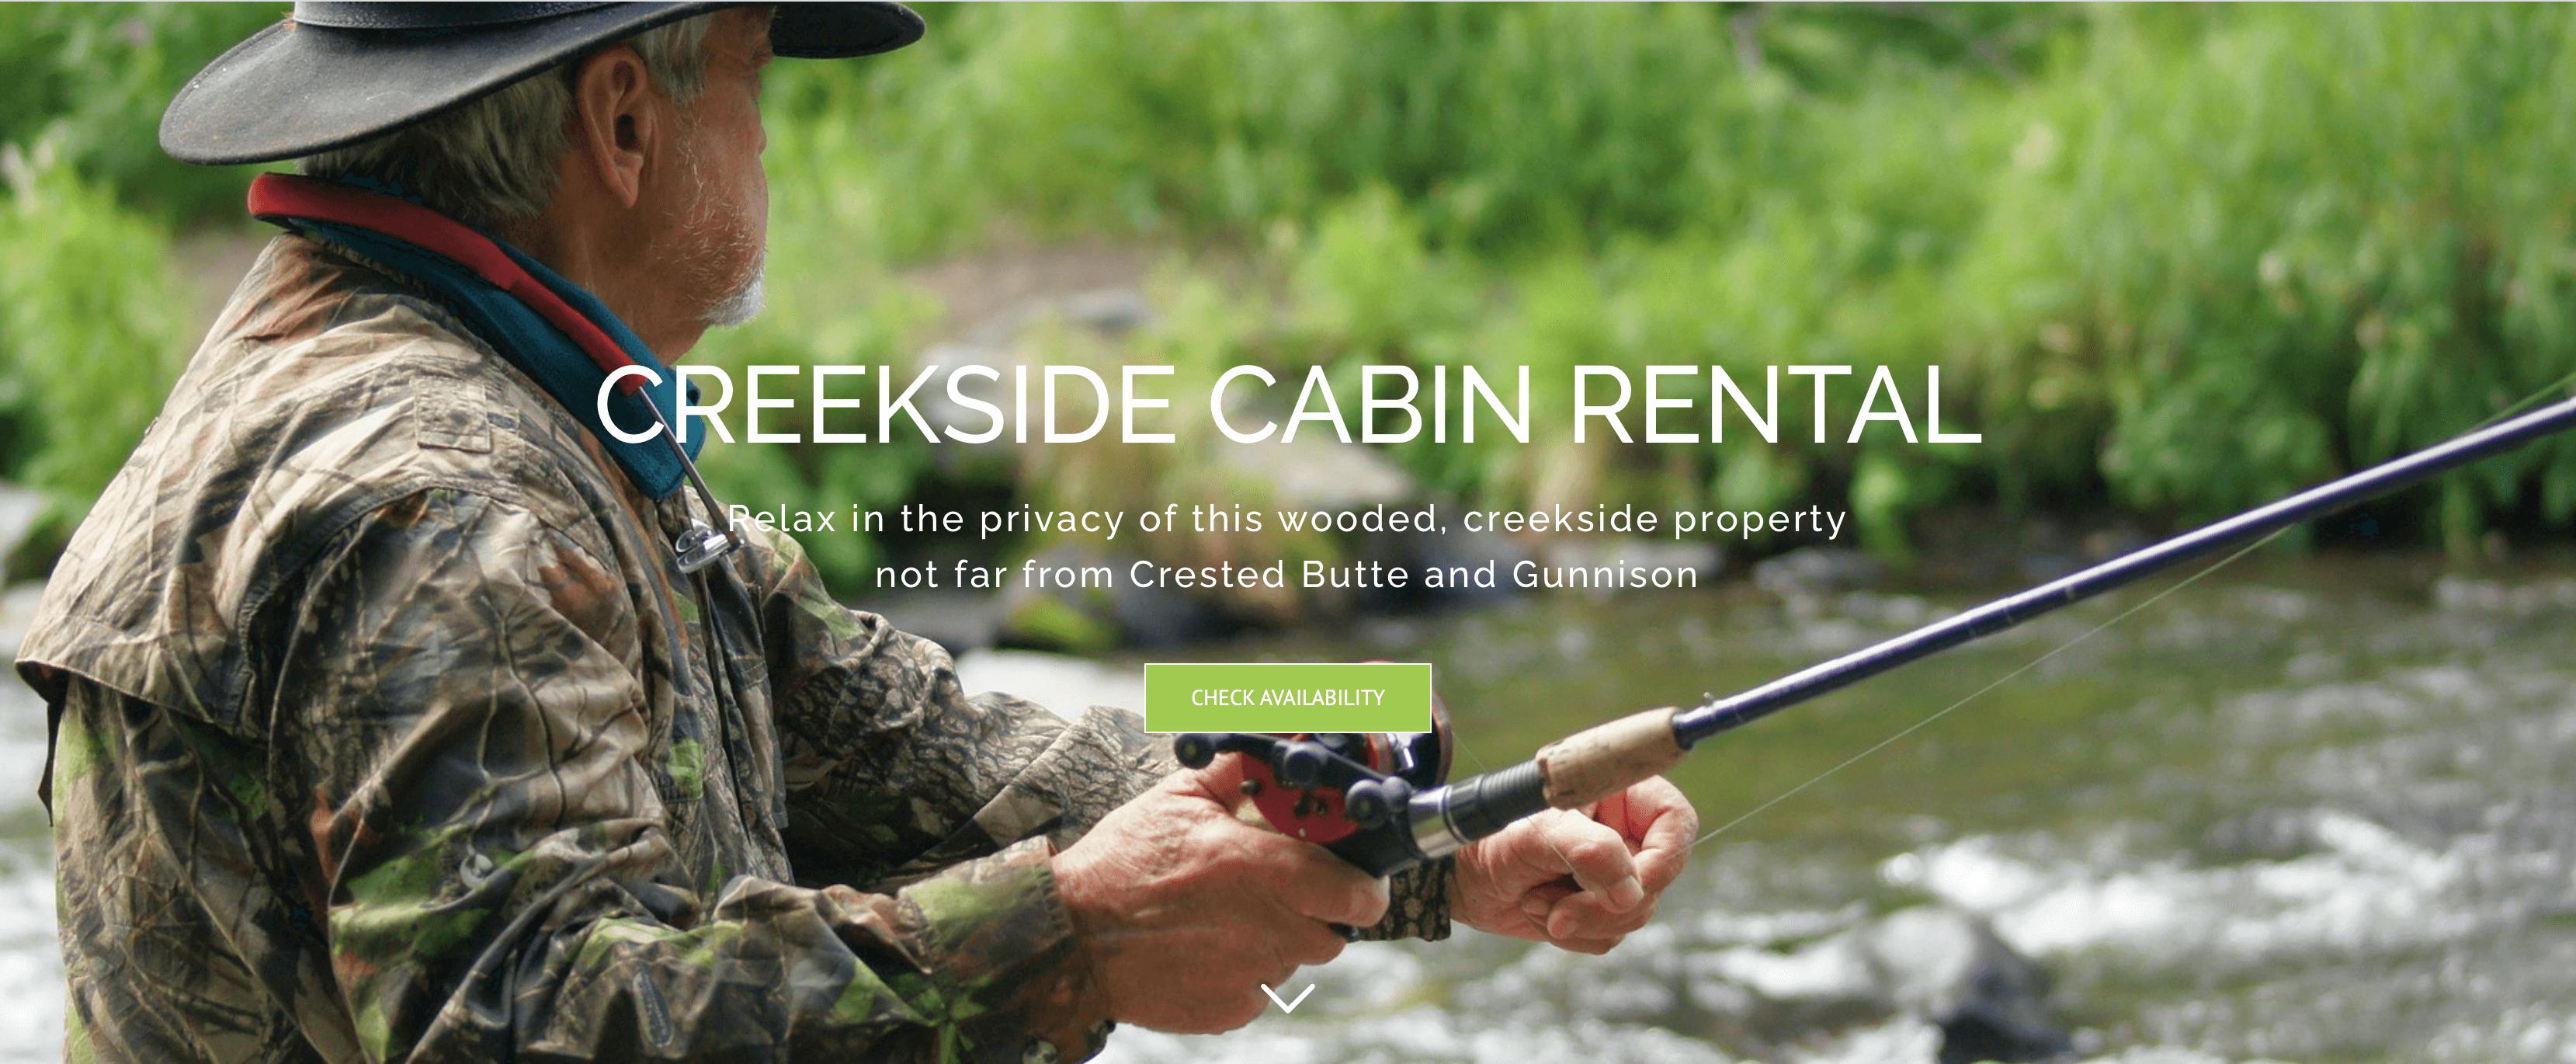 Creekside Cabin Rental